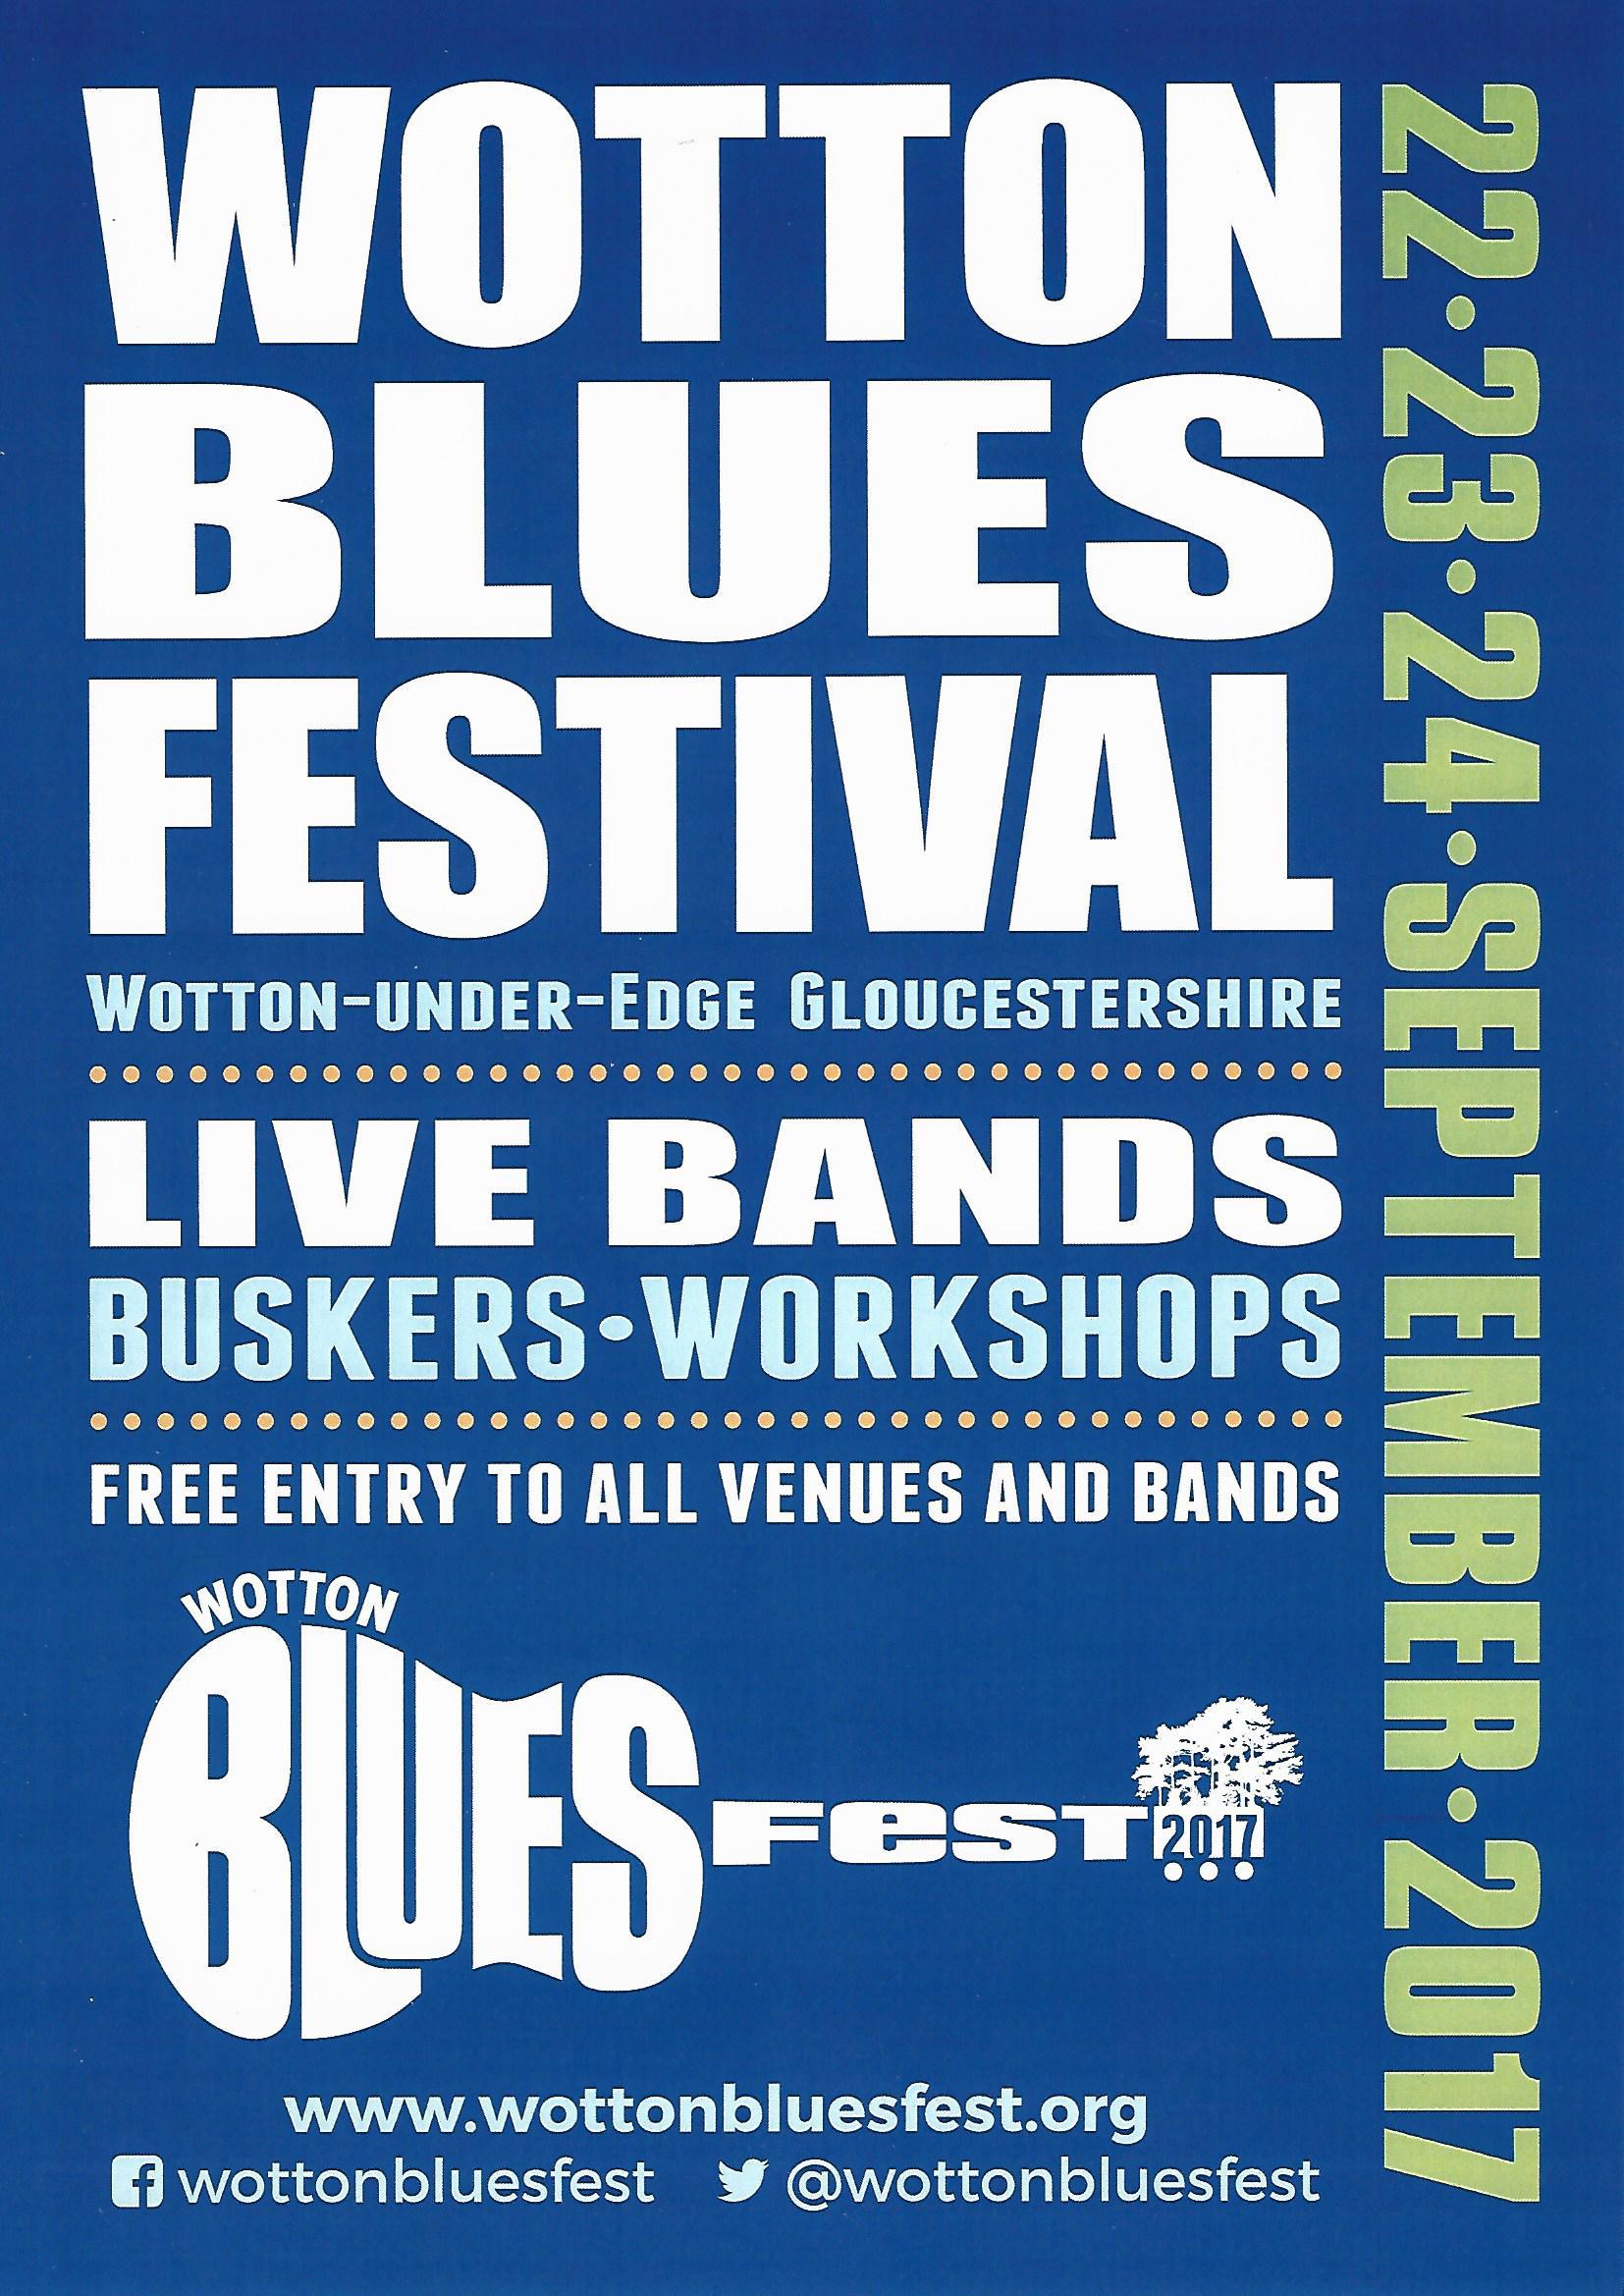 Wotton Bluesfest Poster